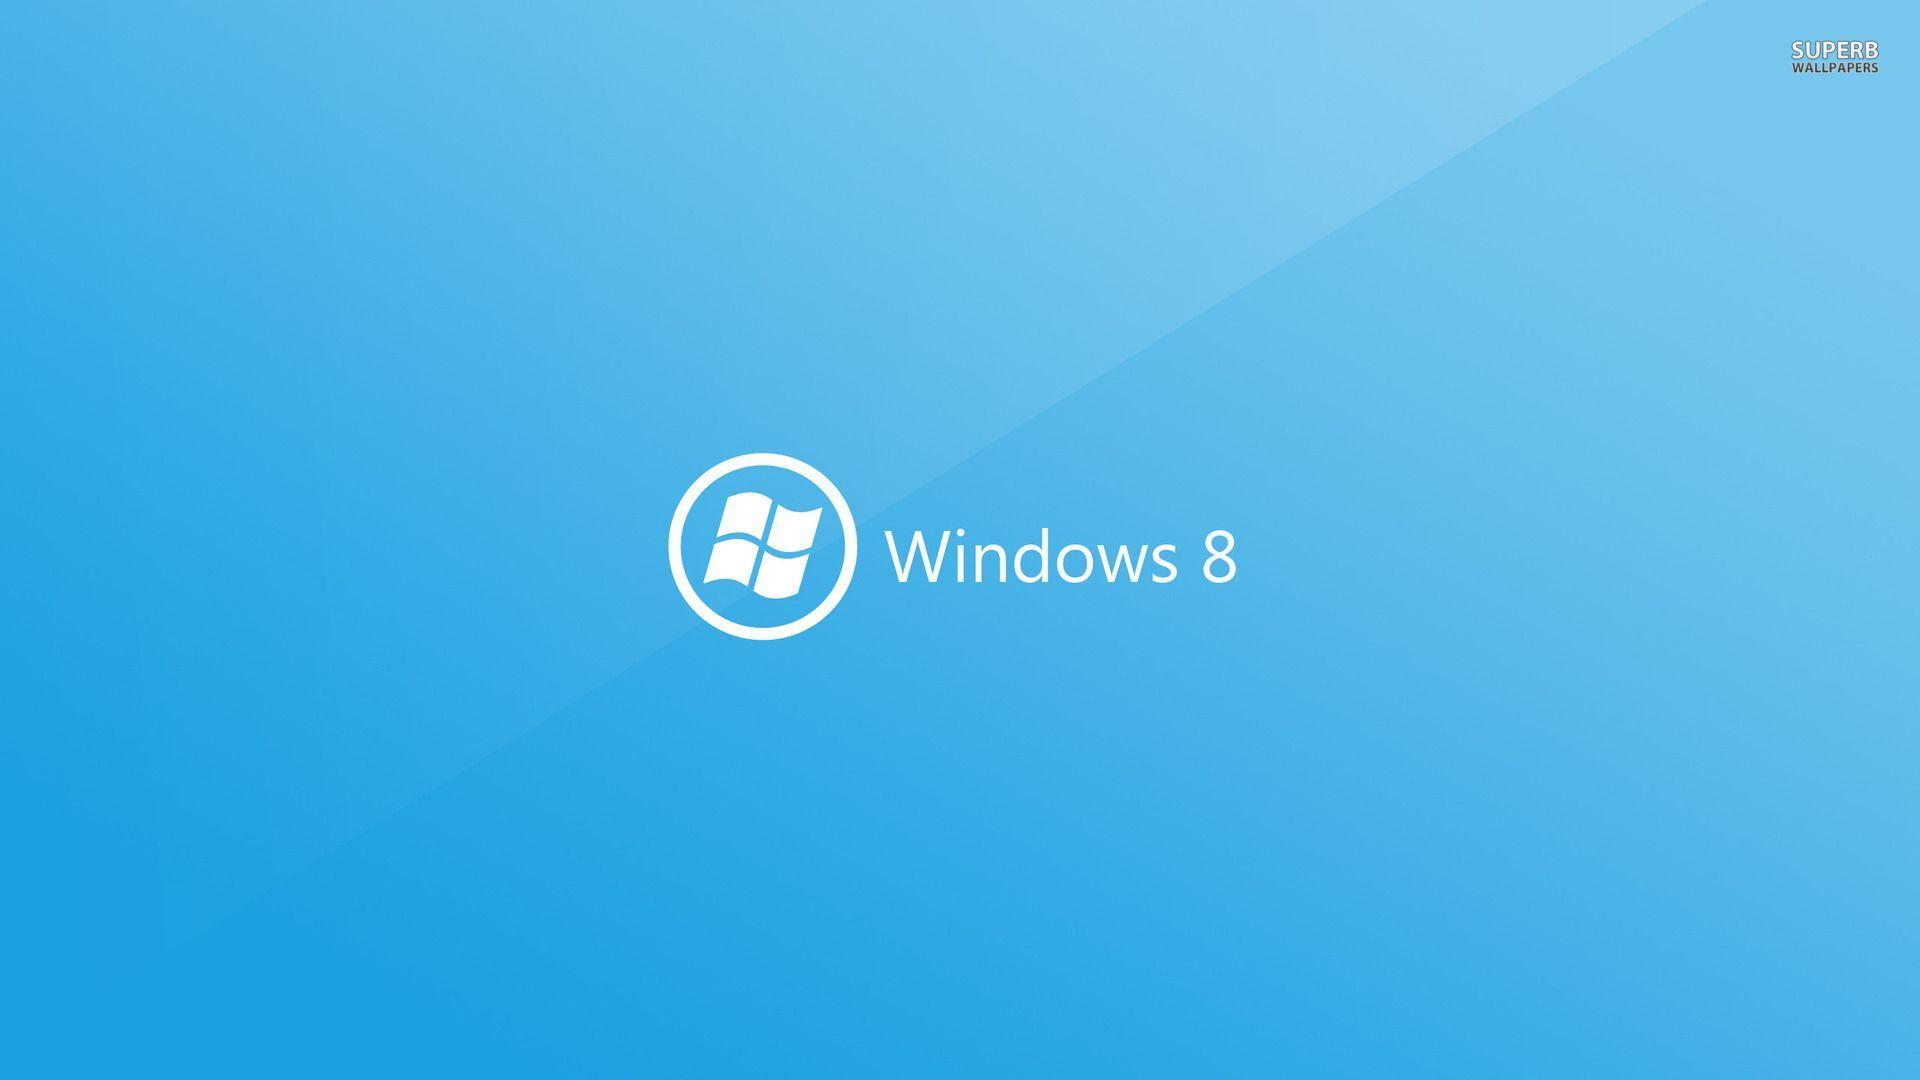 funny windows 8 windows wallpaper id 1446015 desktop nexus technology